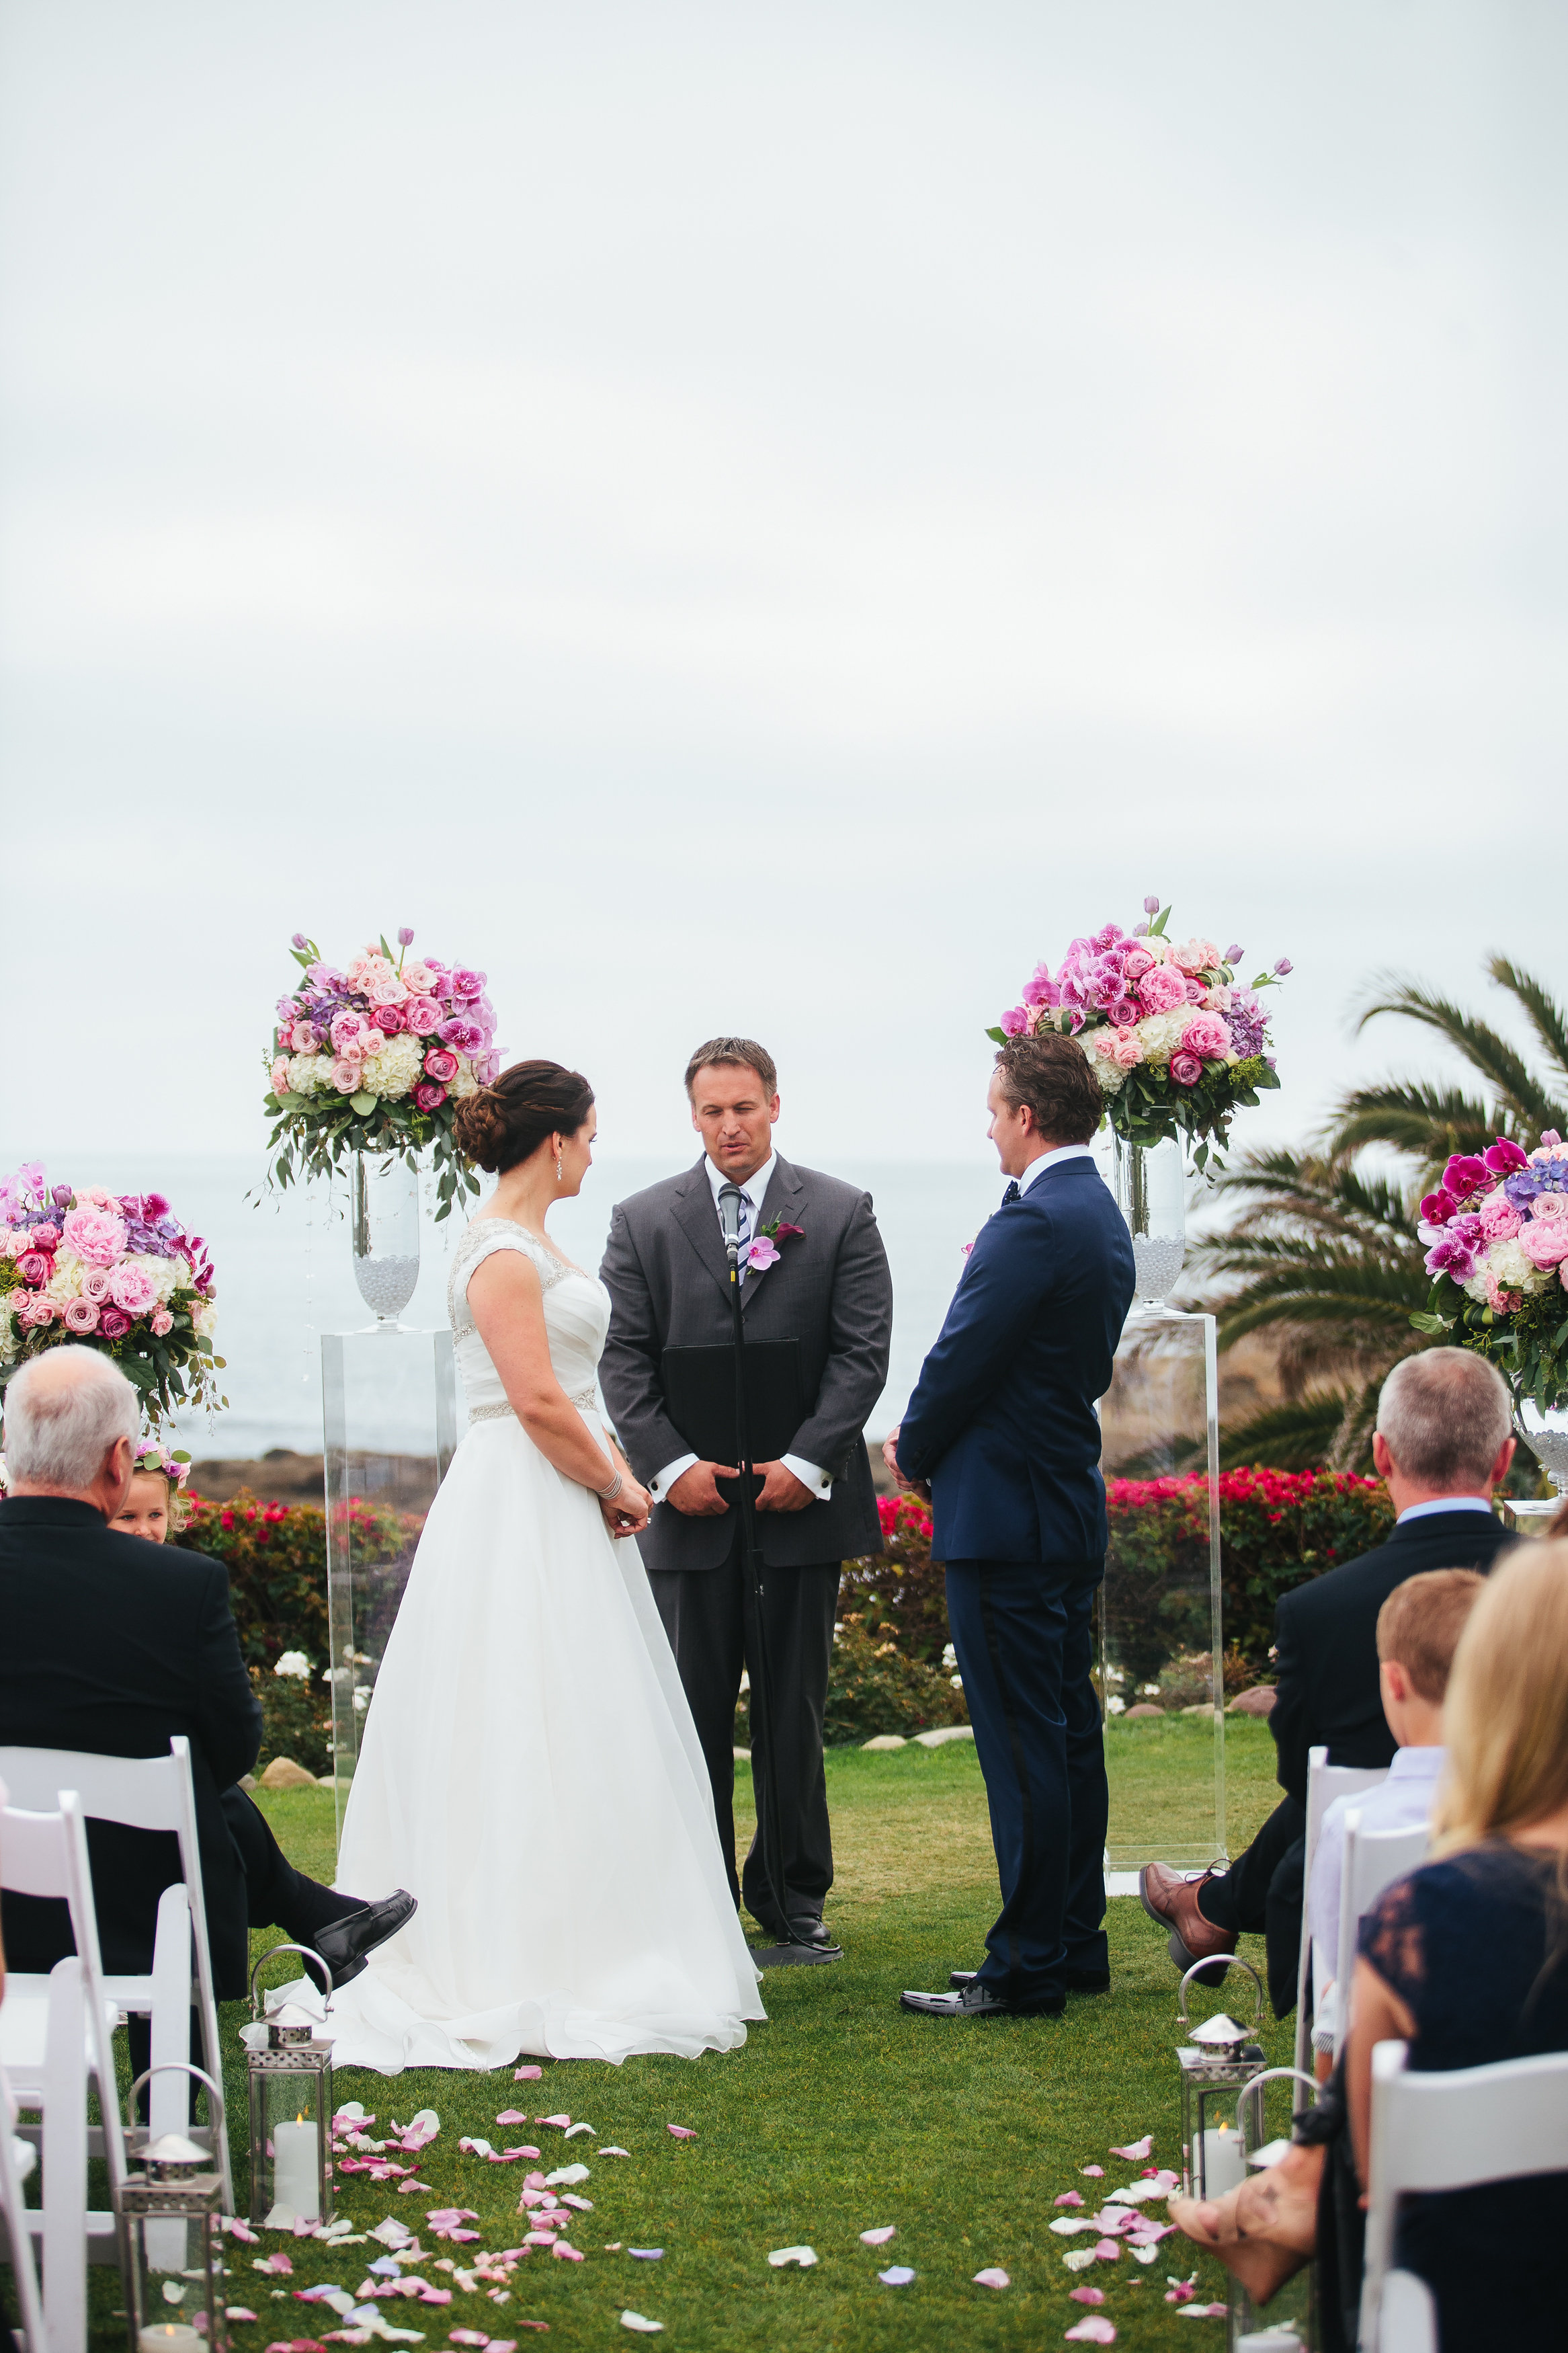 Purple, Pink, and Ivory Wedding at Montage Laguna Beach. Image by Amanda McKinnon.